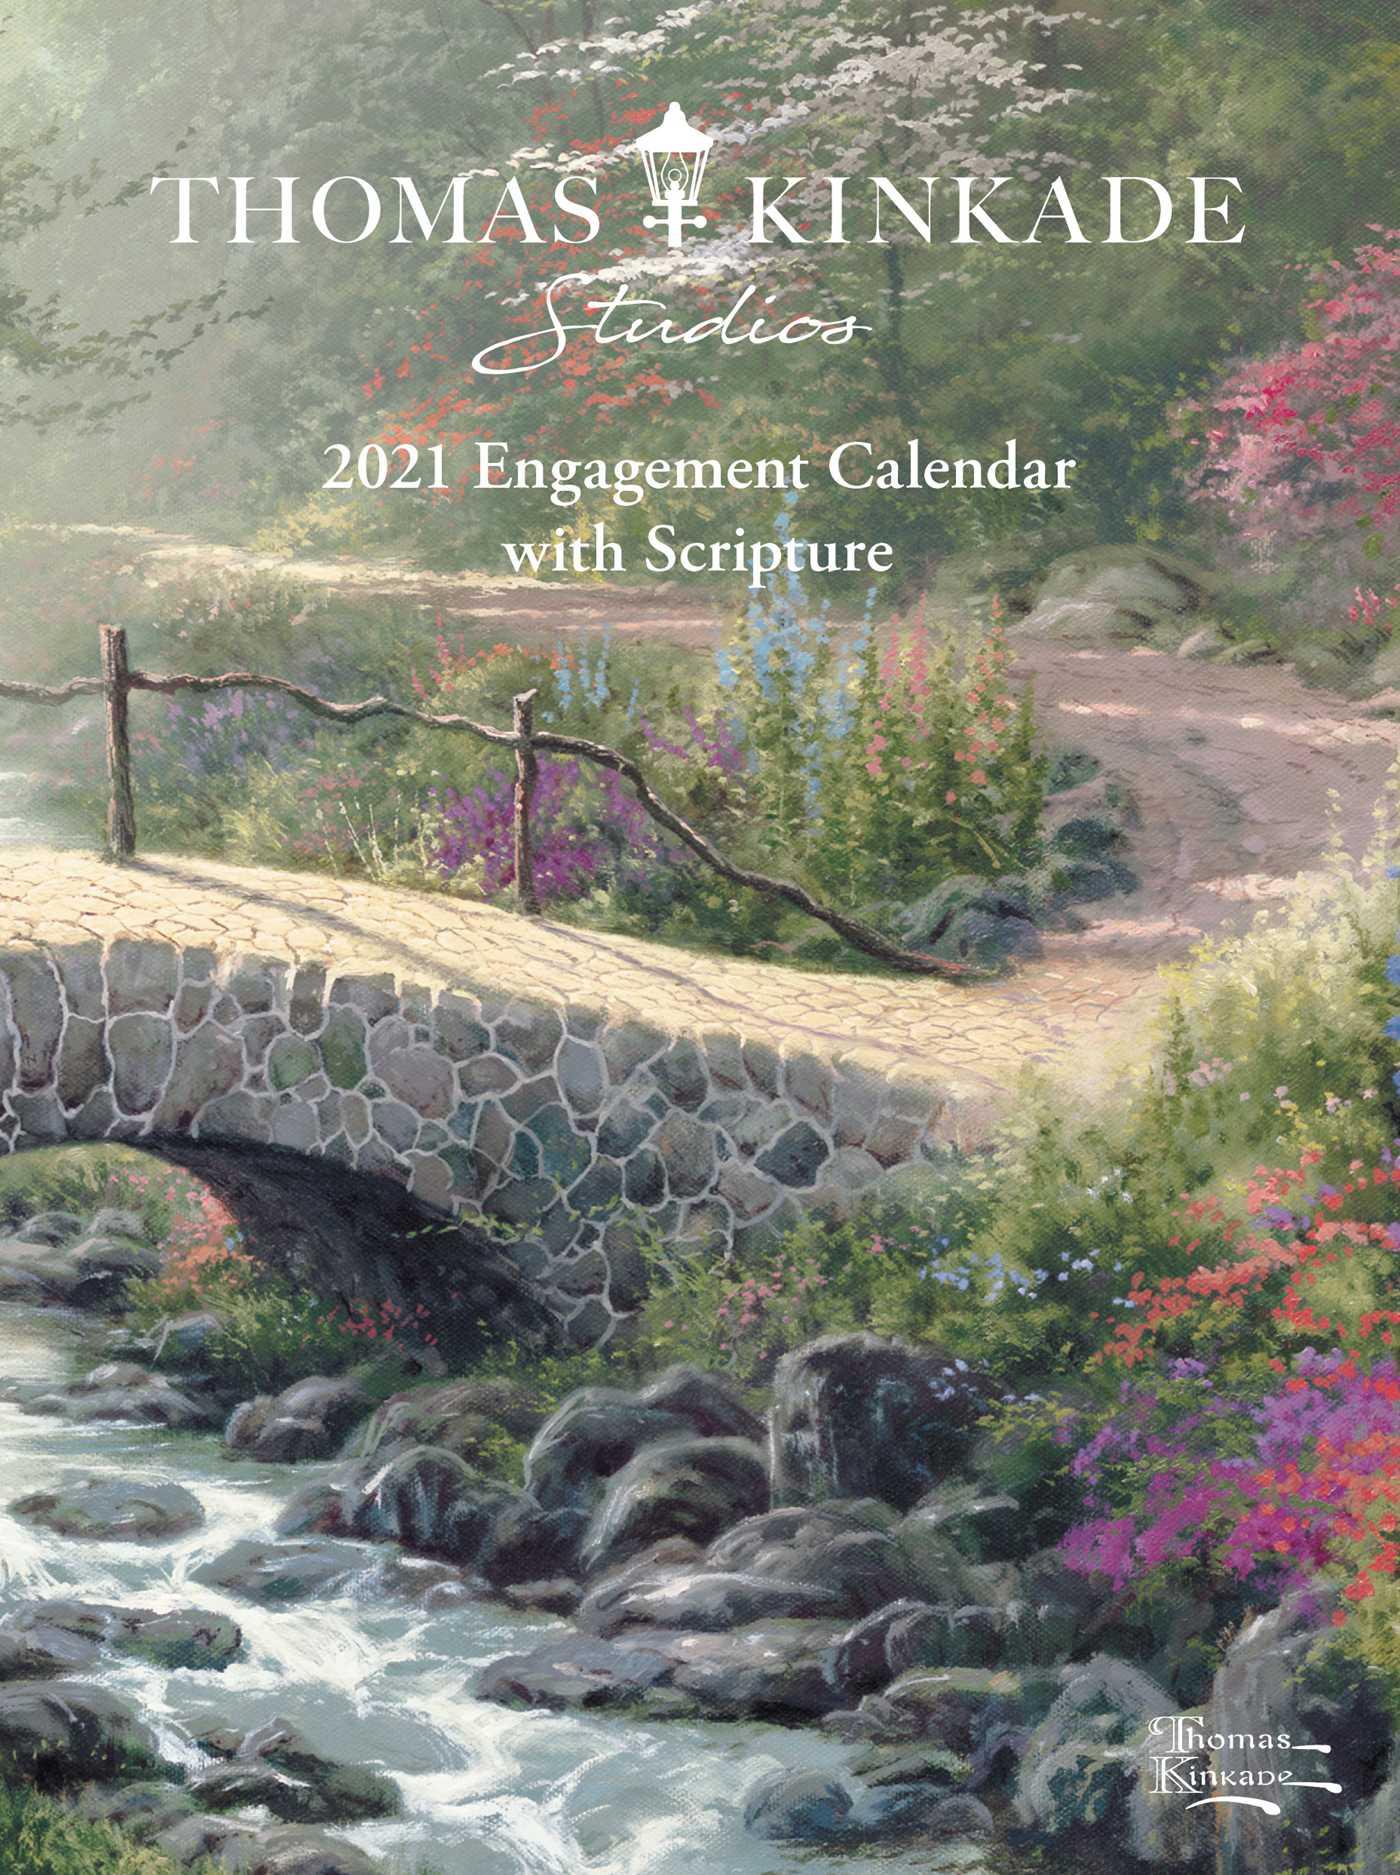 2021 Engagement Calendar Thomas Kinkade Studios 2021 Engagement Calendar with Scripture